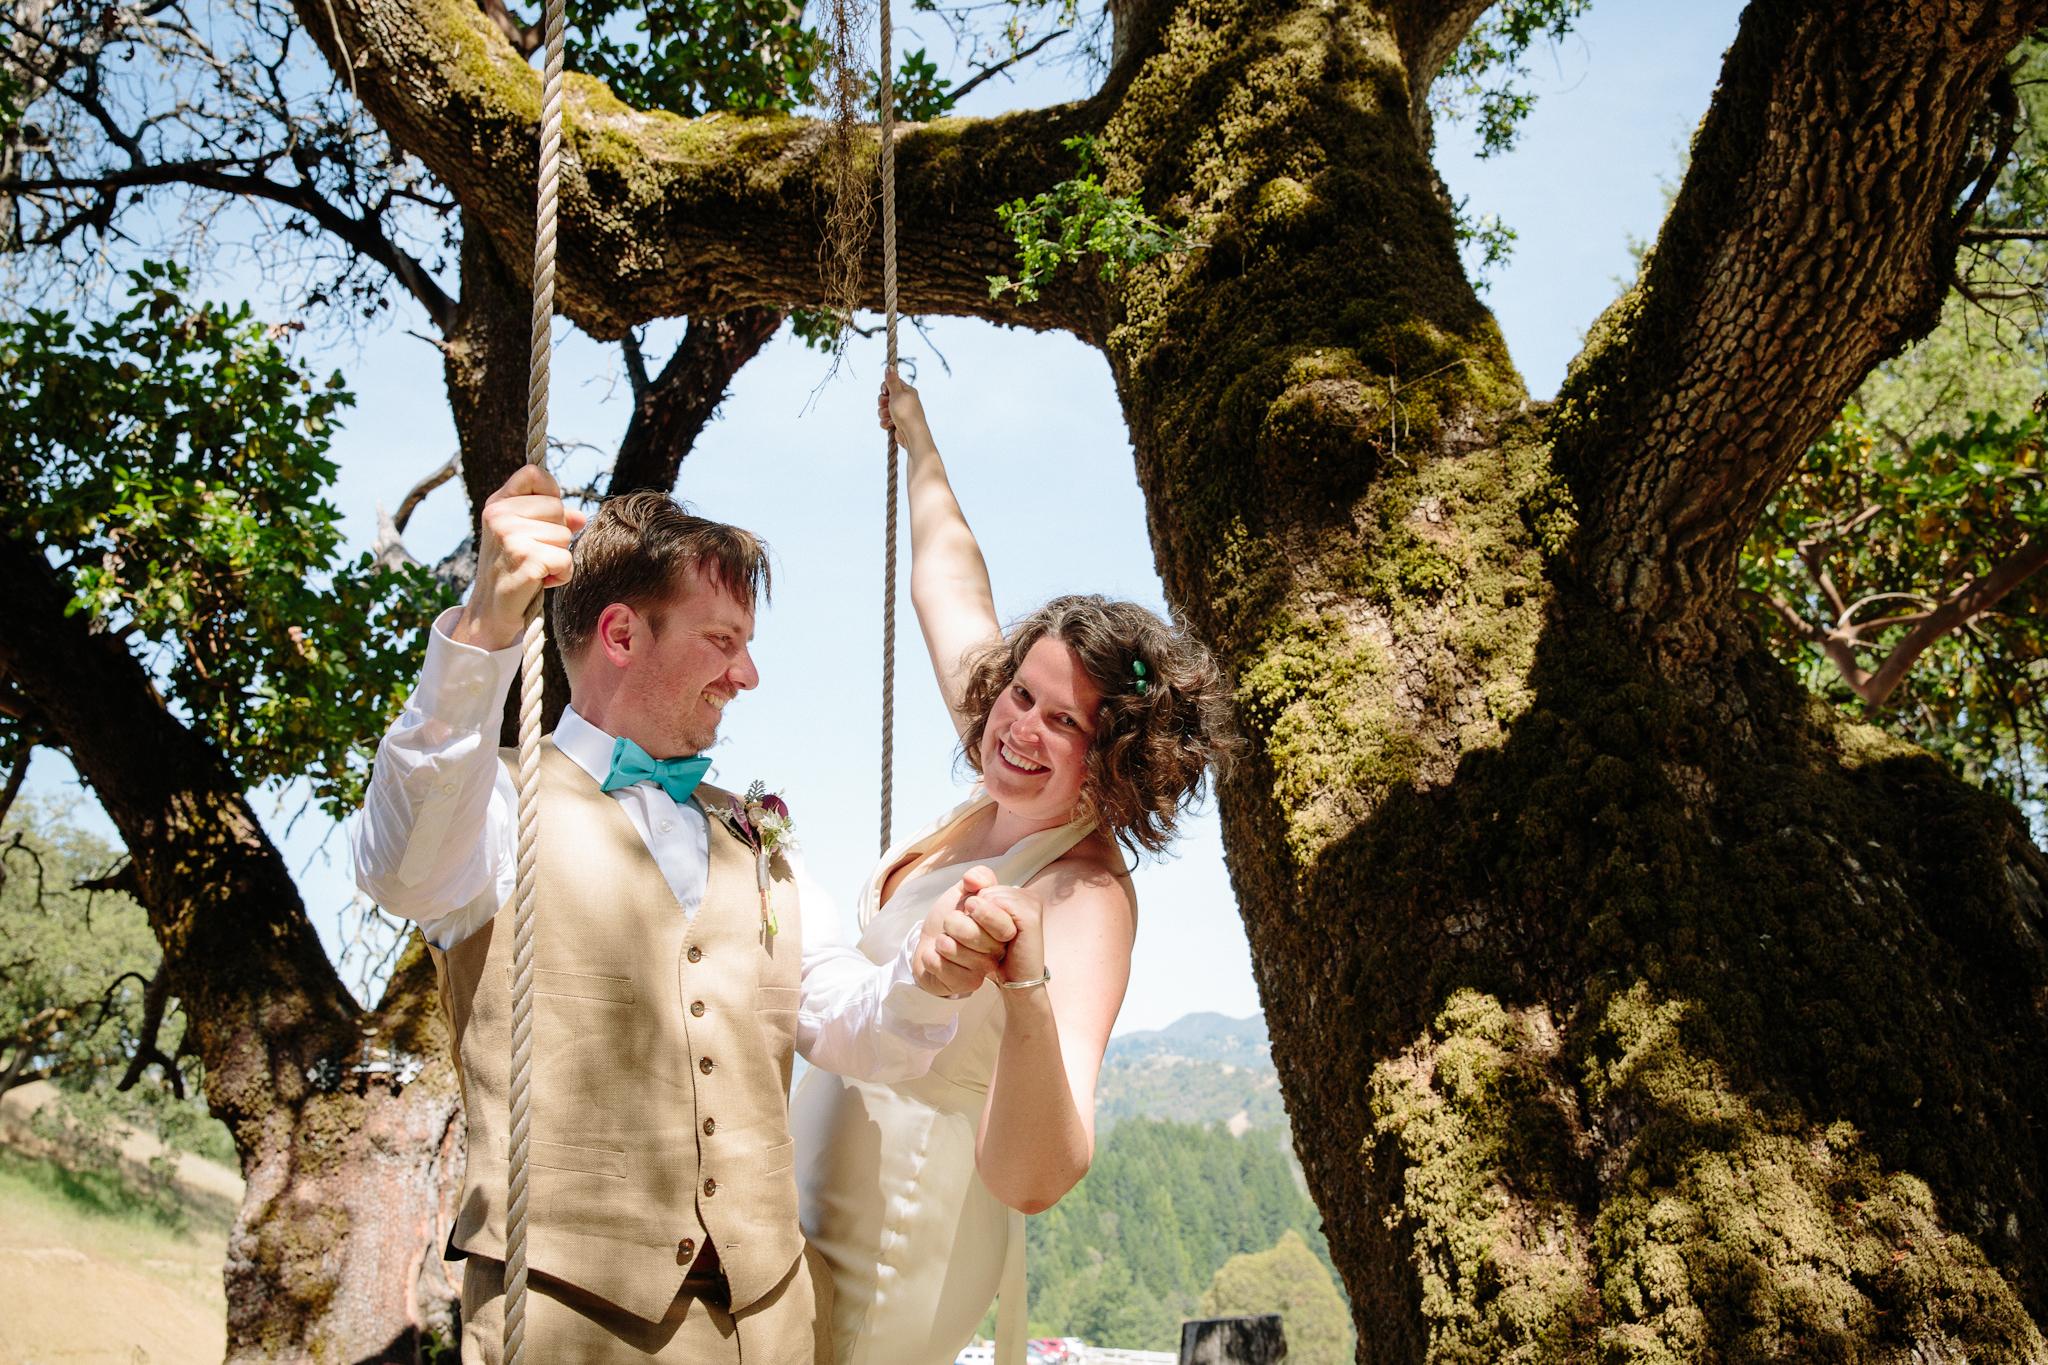 crystalchristiaan_weddingsneakpeek_2014_jenniferleahyphotography-10-of-43_14140070407_o.jpg